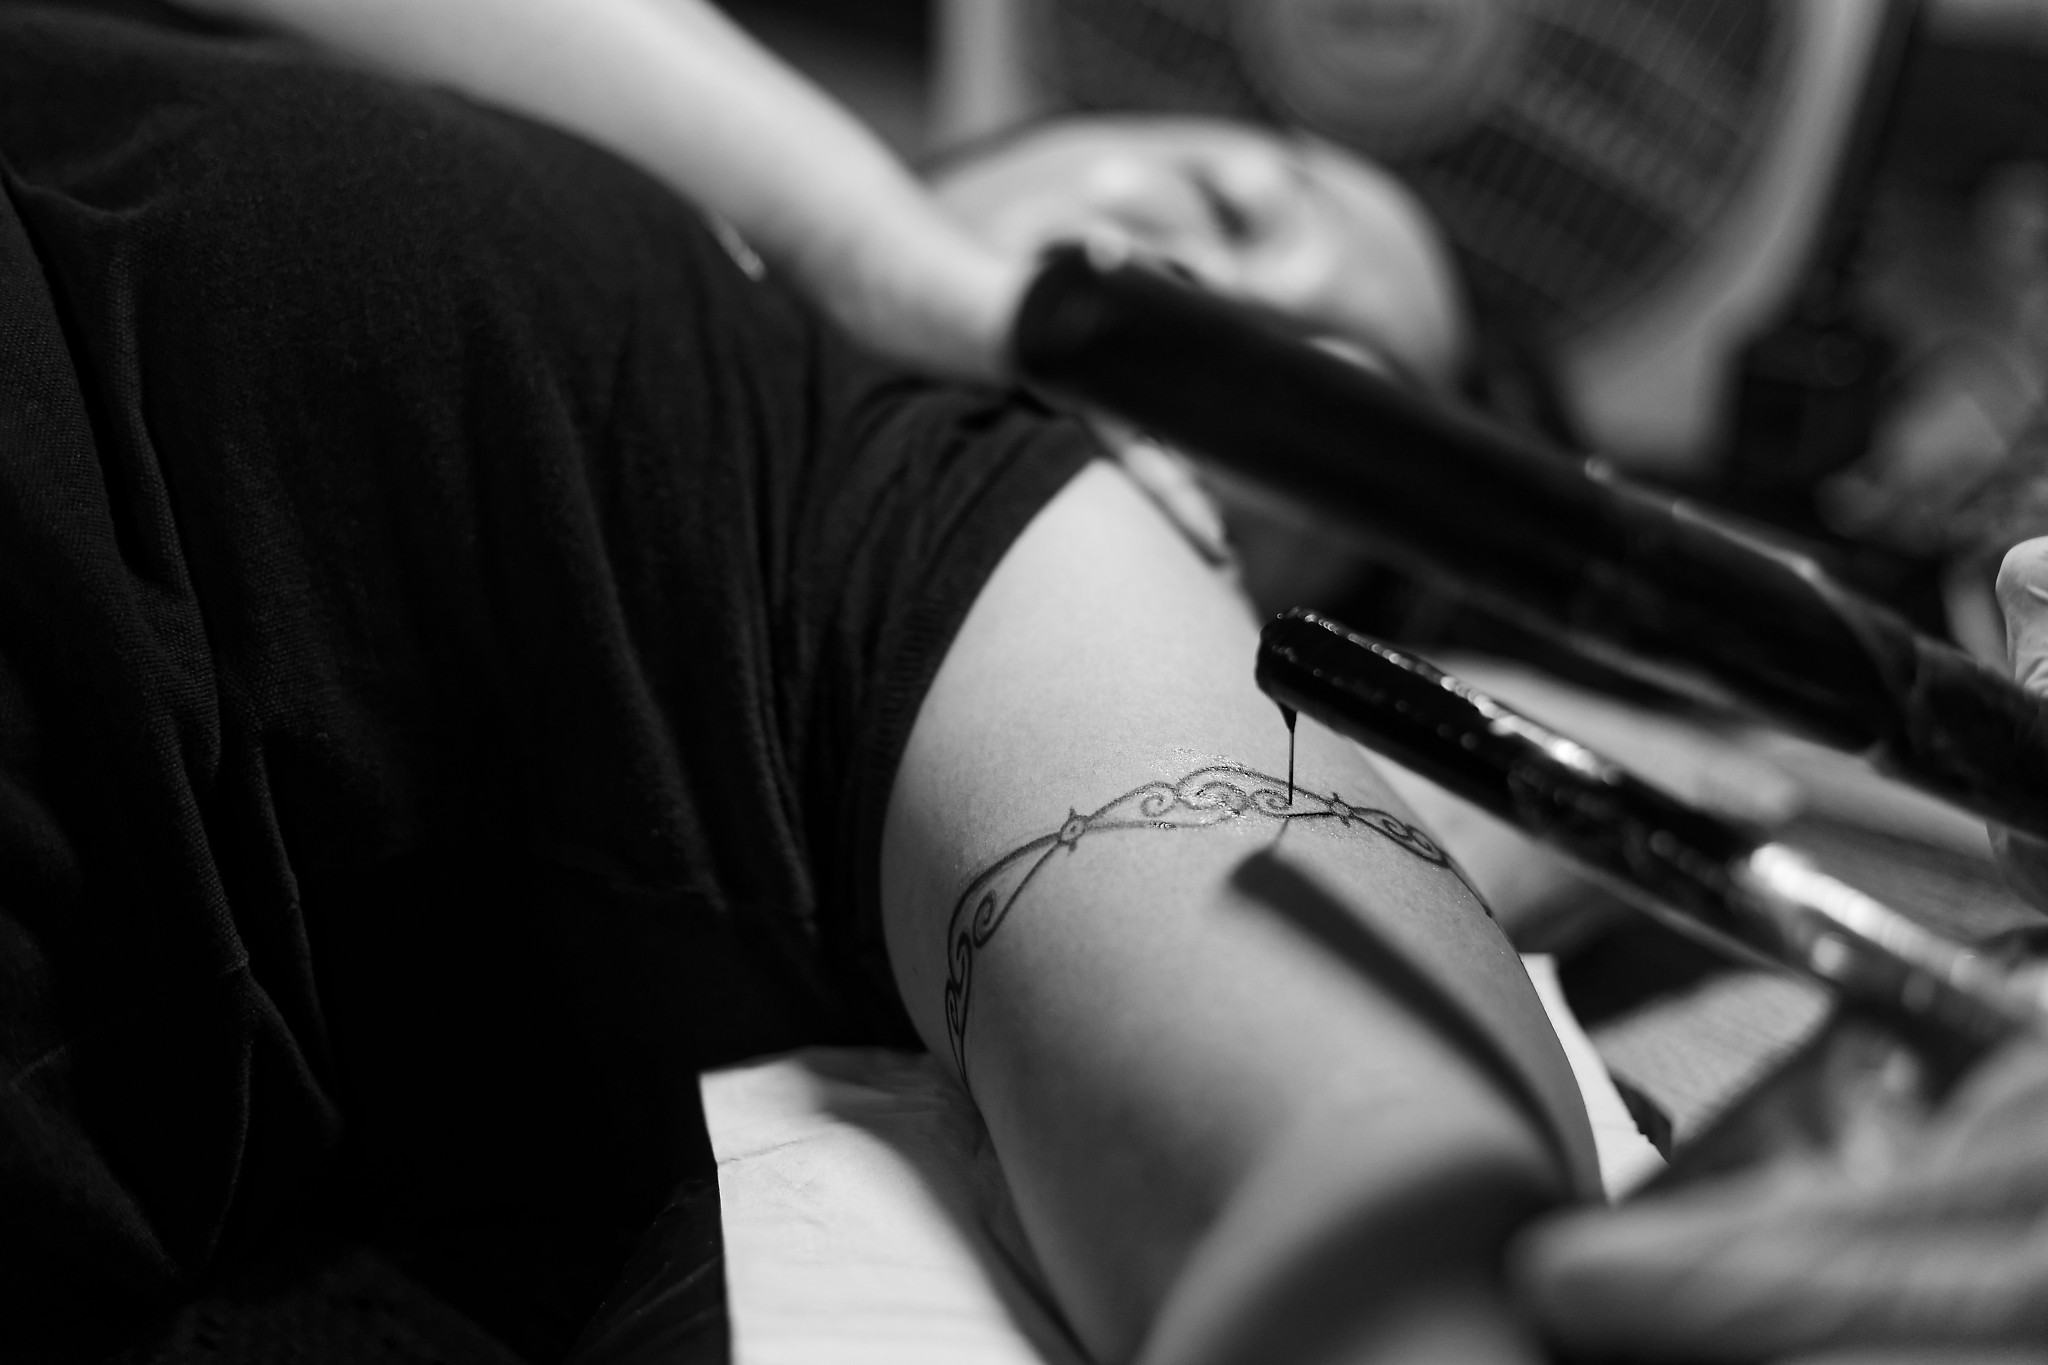 Tribal Ink: Writing stories on human skin